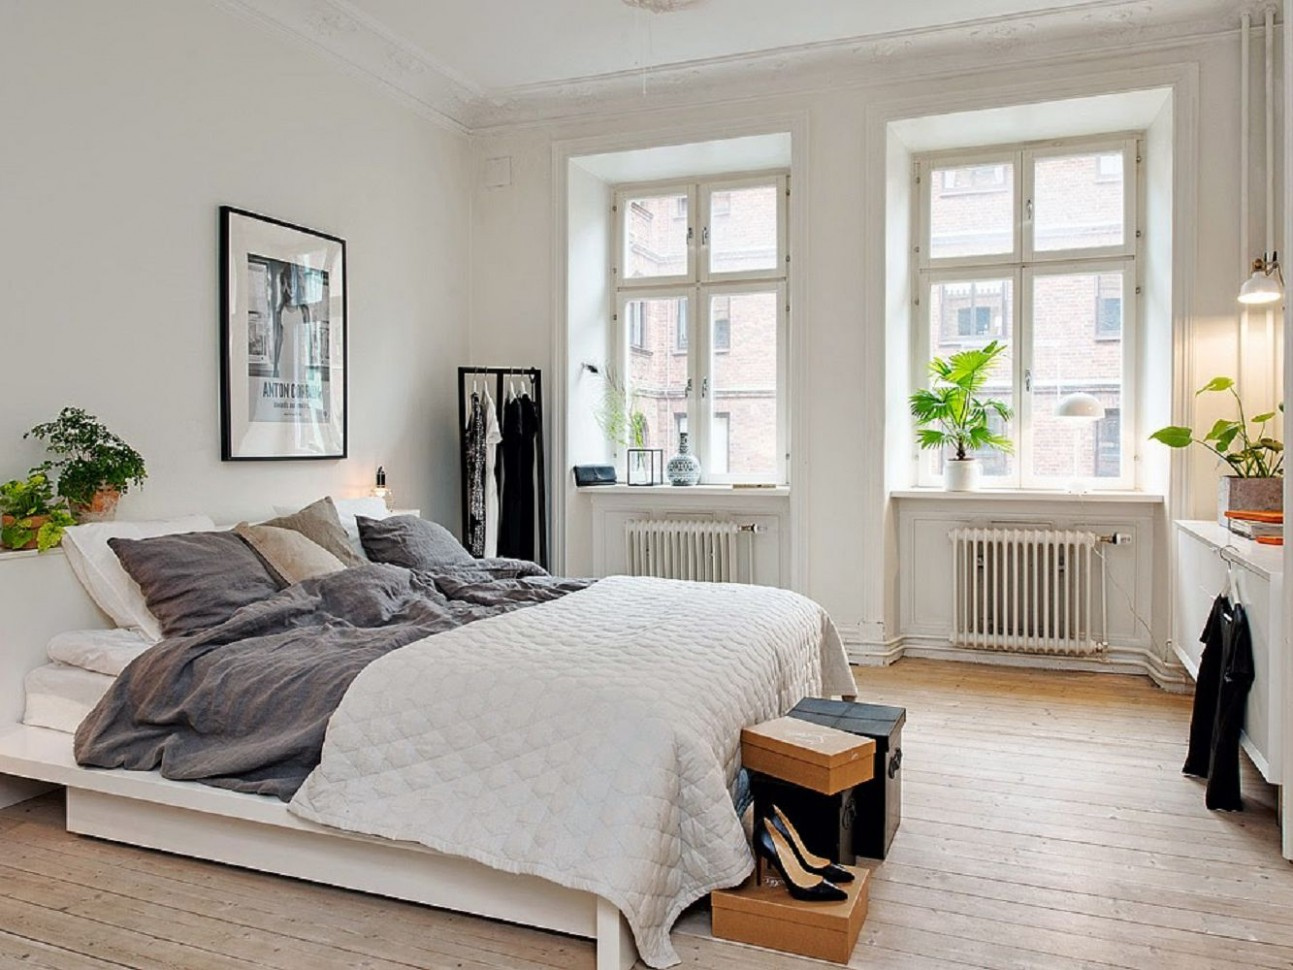 12 Scandinavian Bedroom Design Ideas - Scandinavian Apartment Decor Ideas